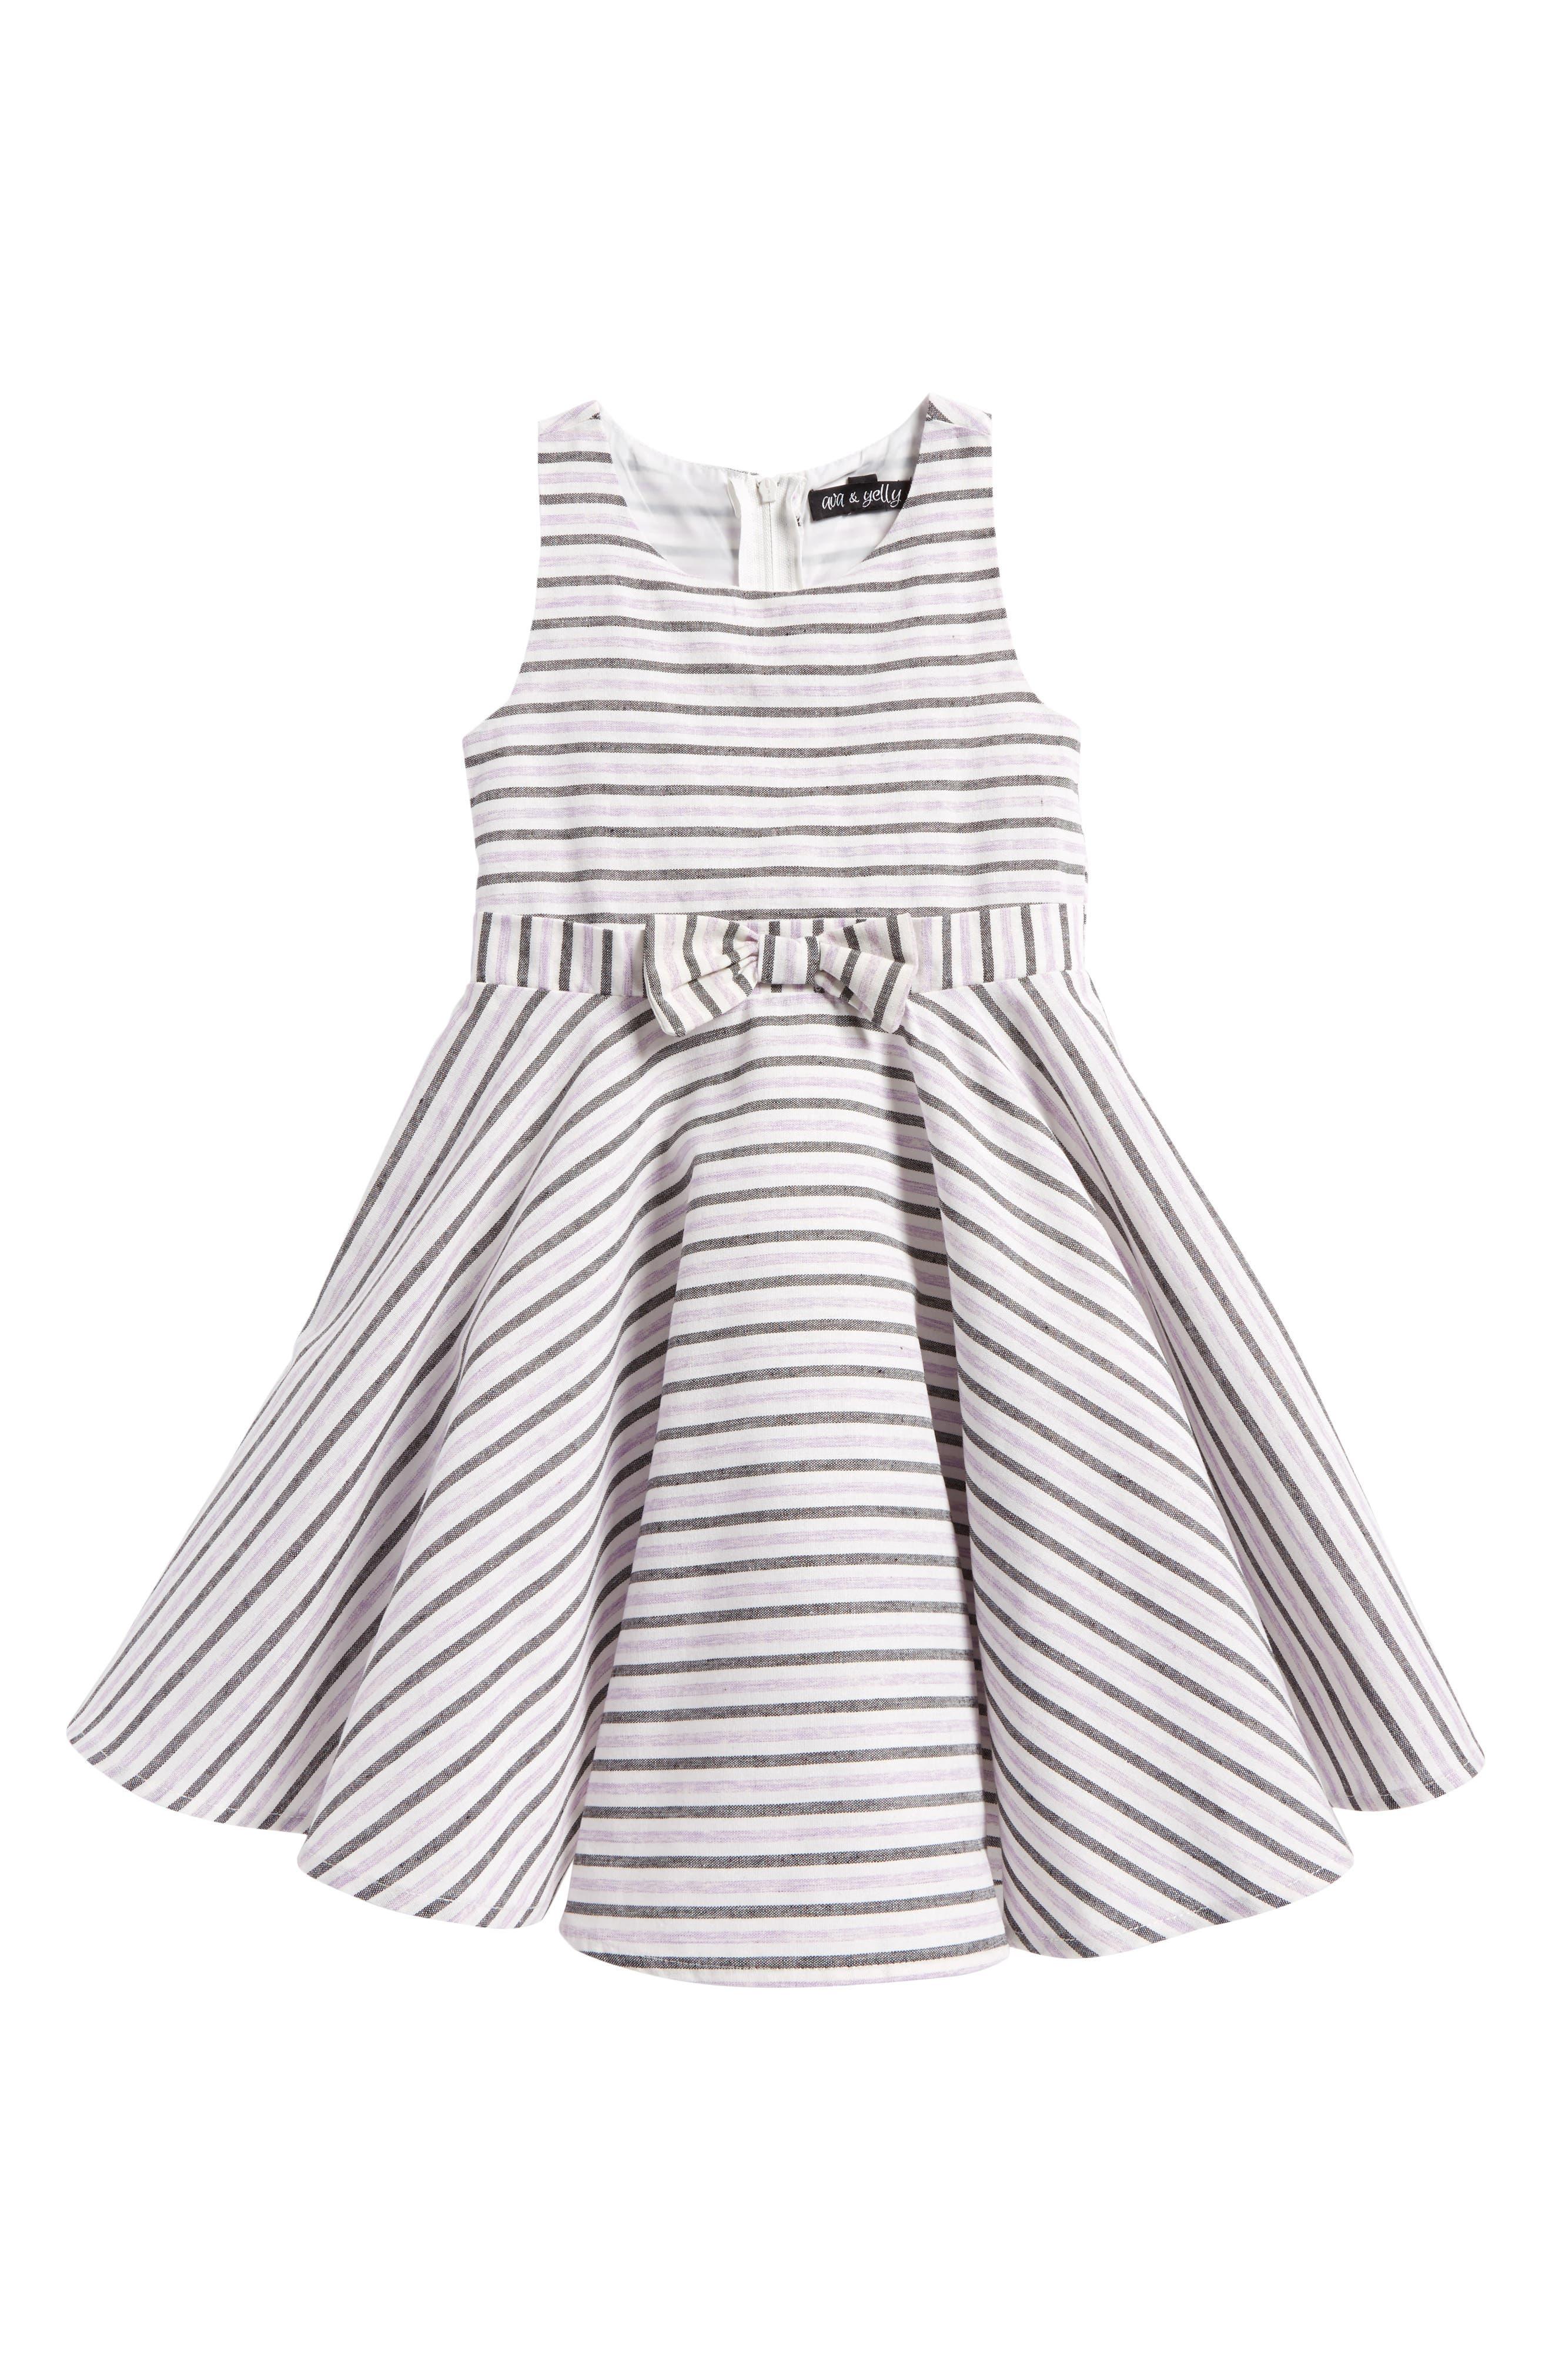 Ava & Yelly Stripe Cotton Dress (Toddler Girls & Little Girls)